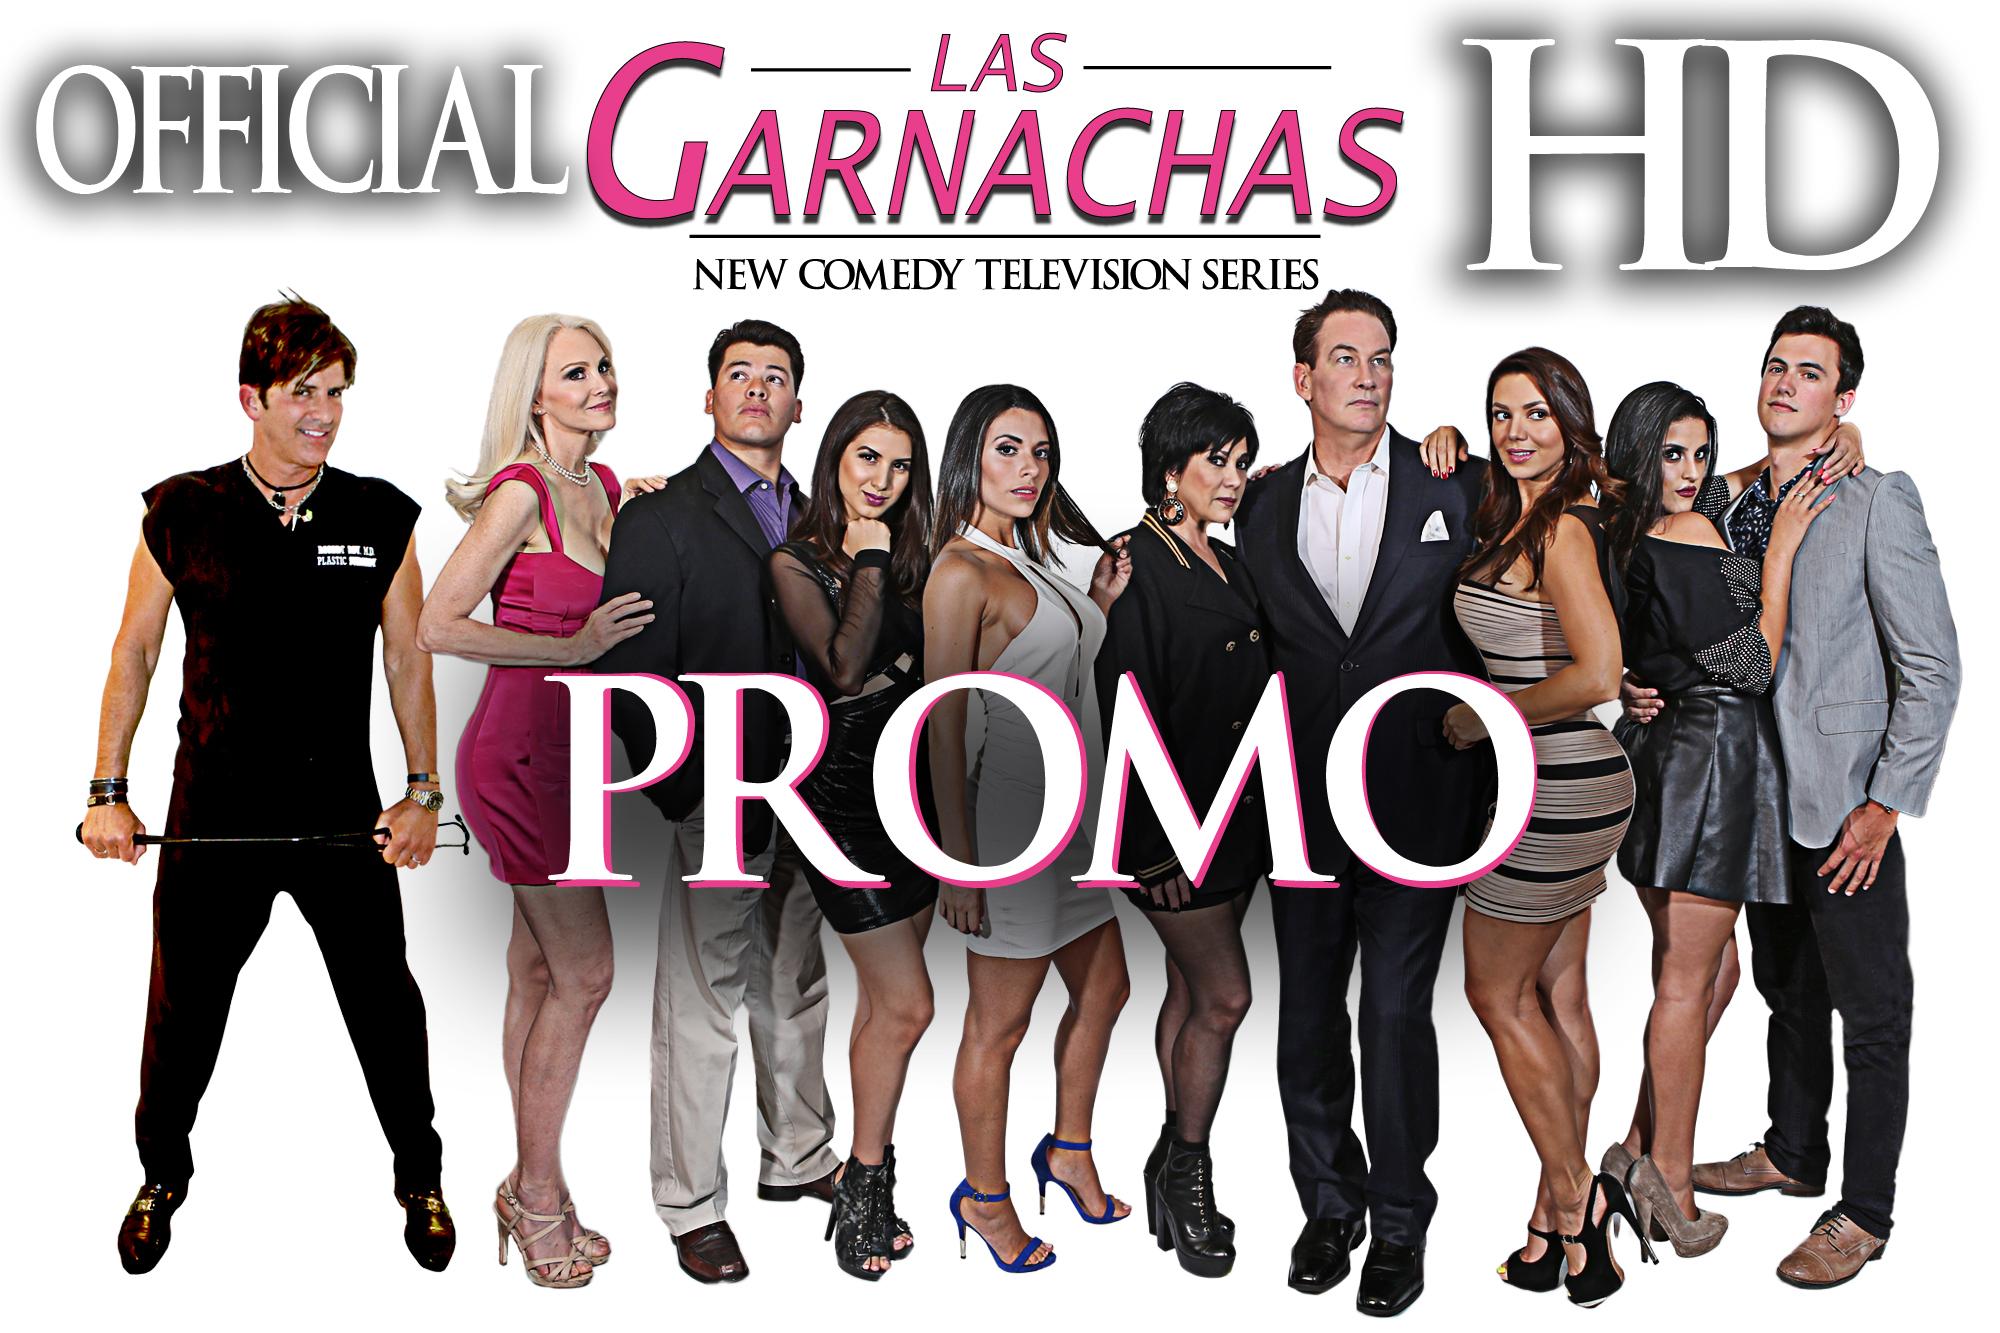 LAS GARNACHAS TELEVISION SERIES OFFICIAL PROMO